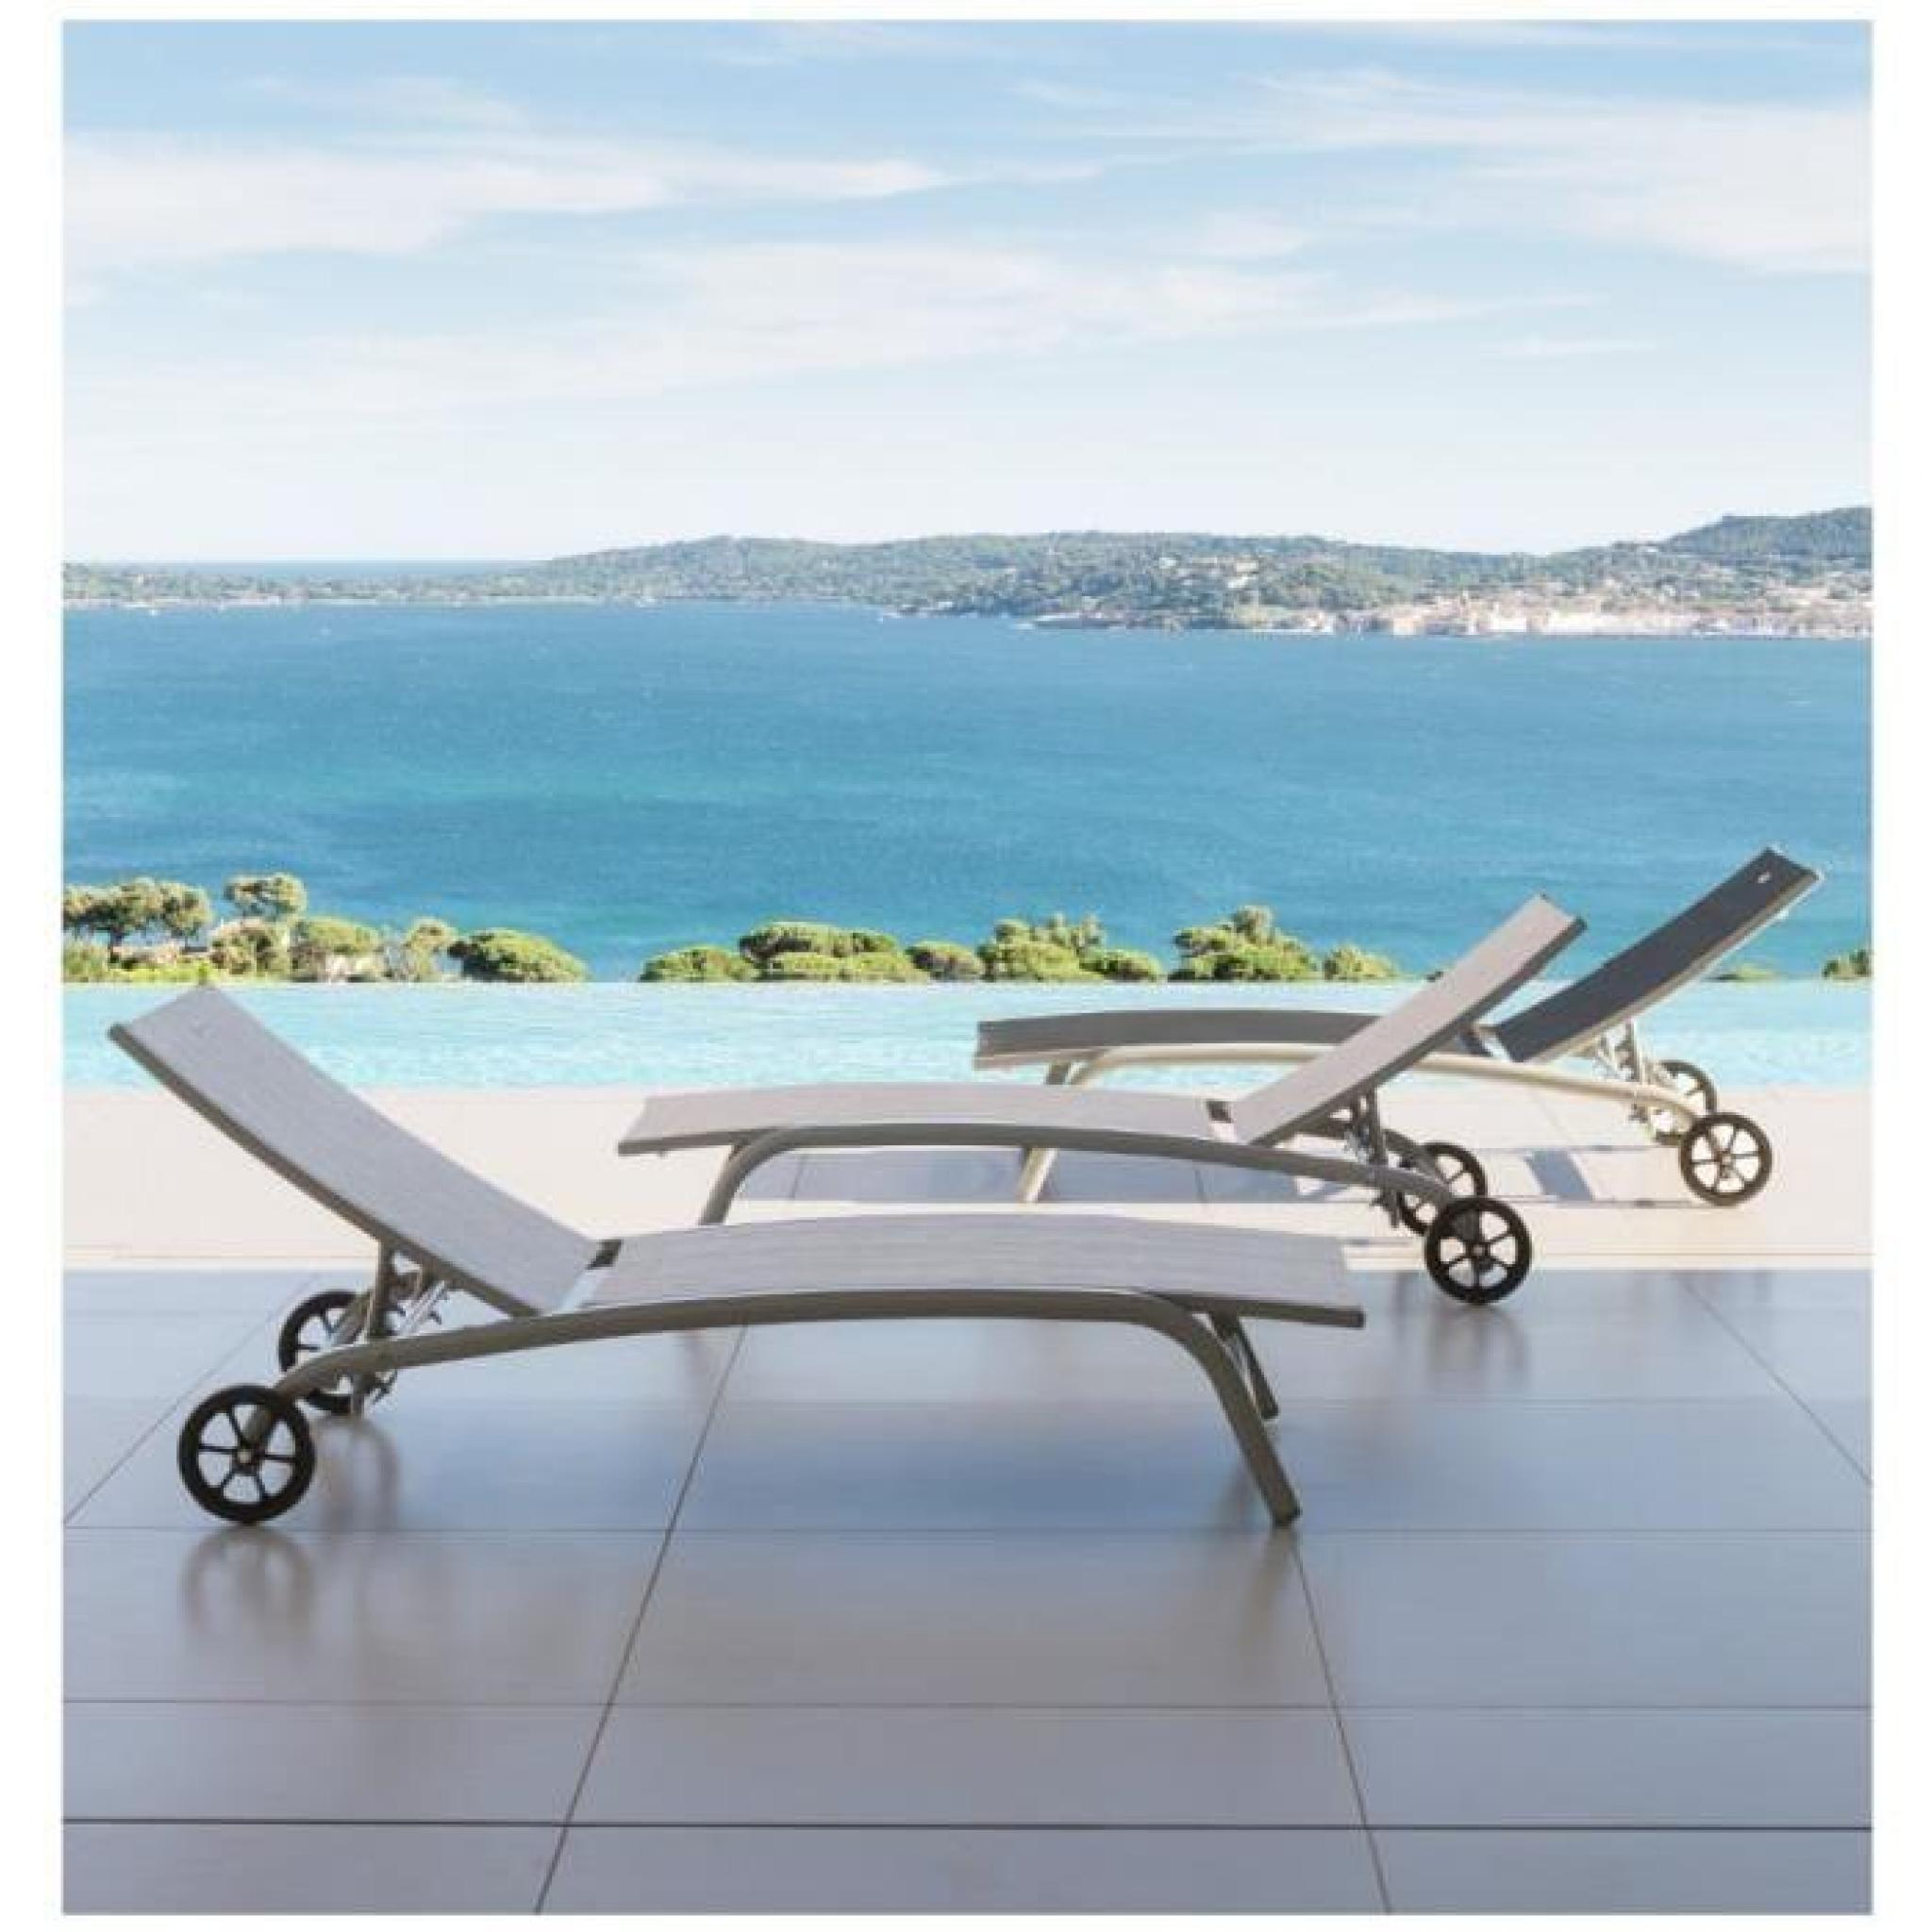 belle bain de soleil nagua hesperide id es de bain de soleil. Black Bedroom Furniture Sets. Home Design Ideas